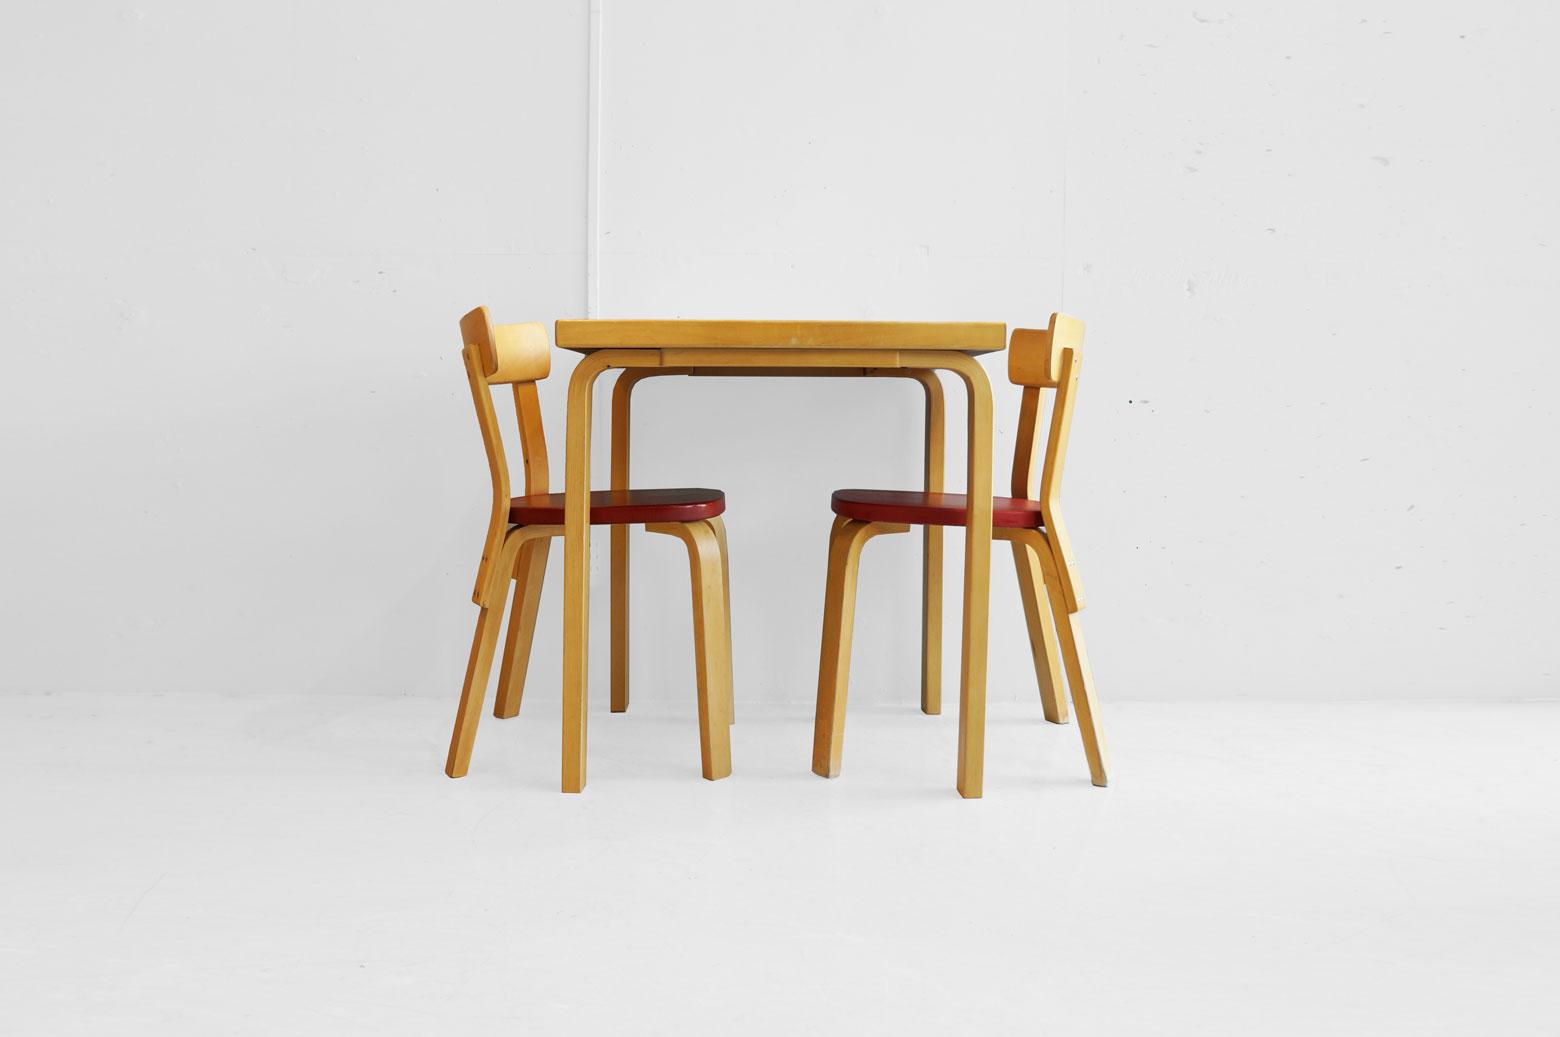 Vintage artek Alvar Aalto Dining Table Chair No.69 set/ヴィンテージ アルテック アルヴァ・アアルト ダイニングテーブル チェアNo.69 セット